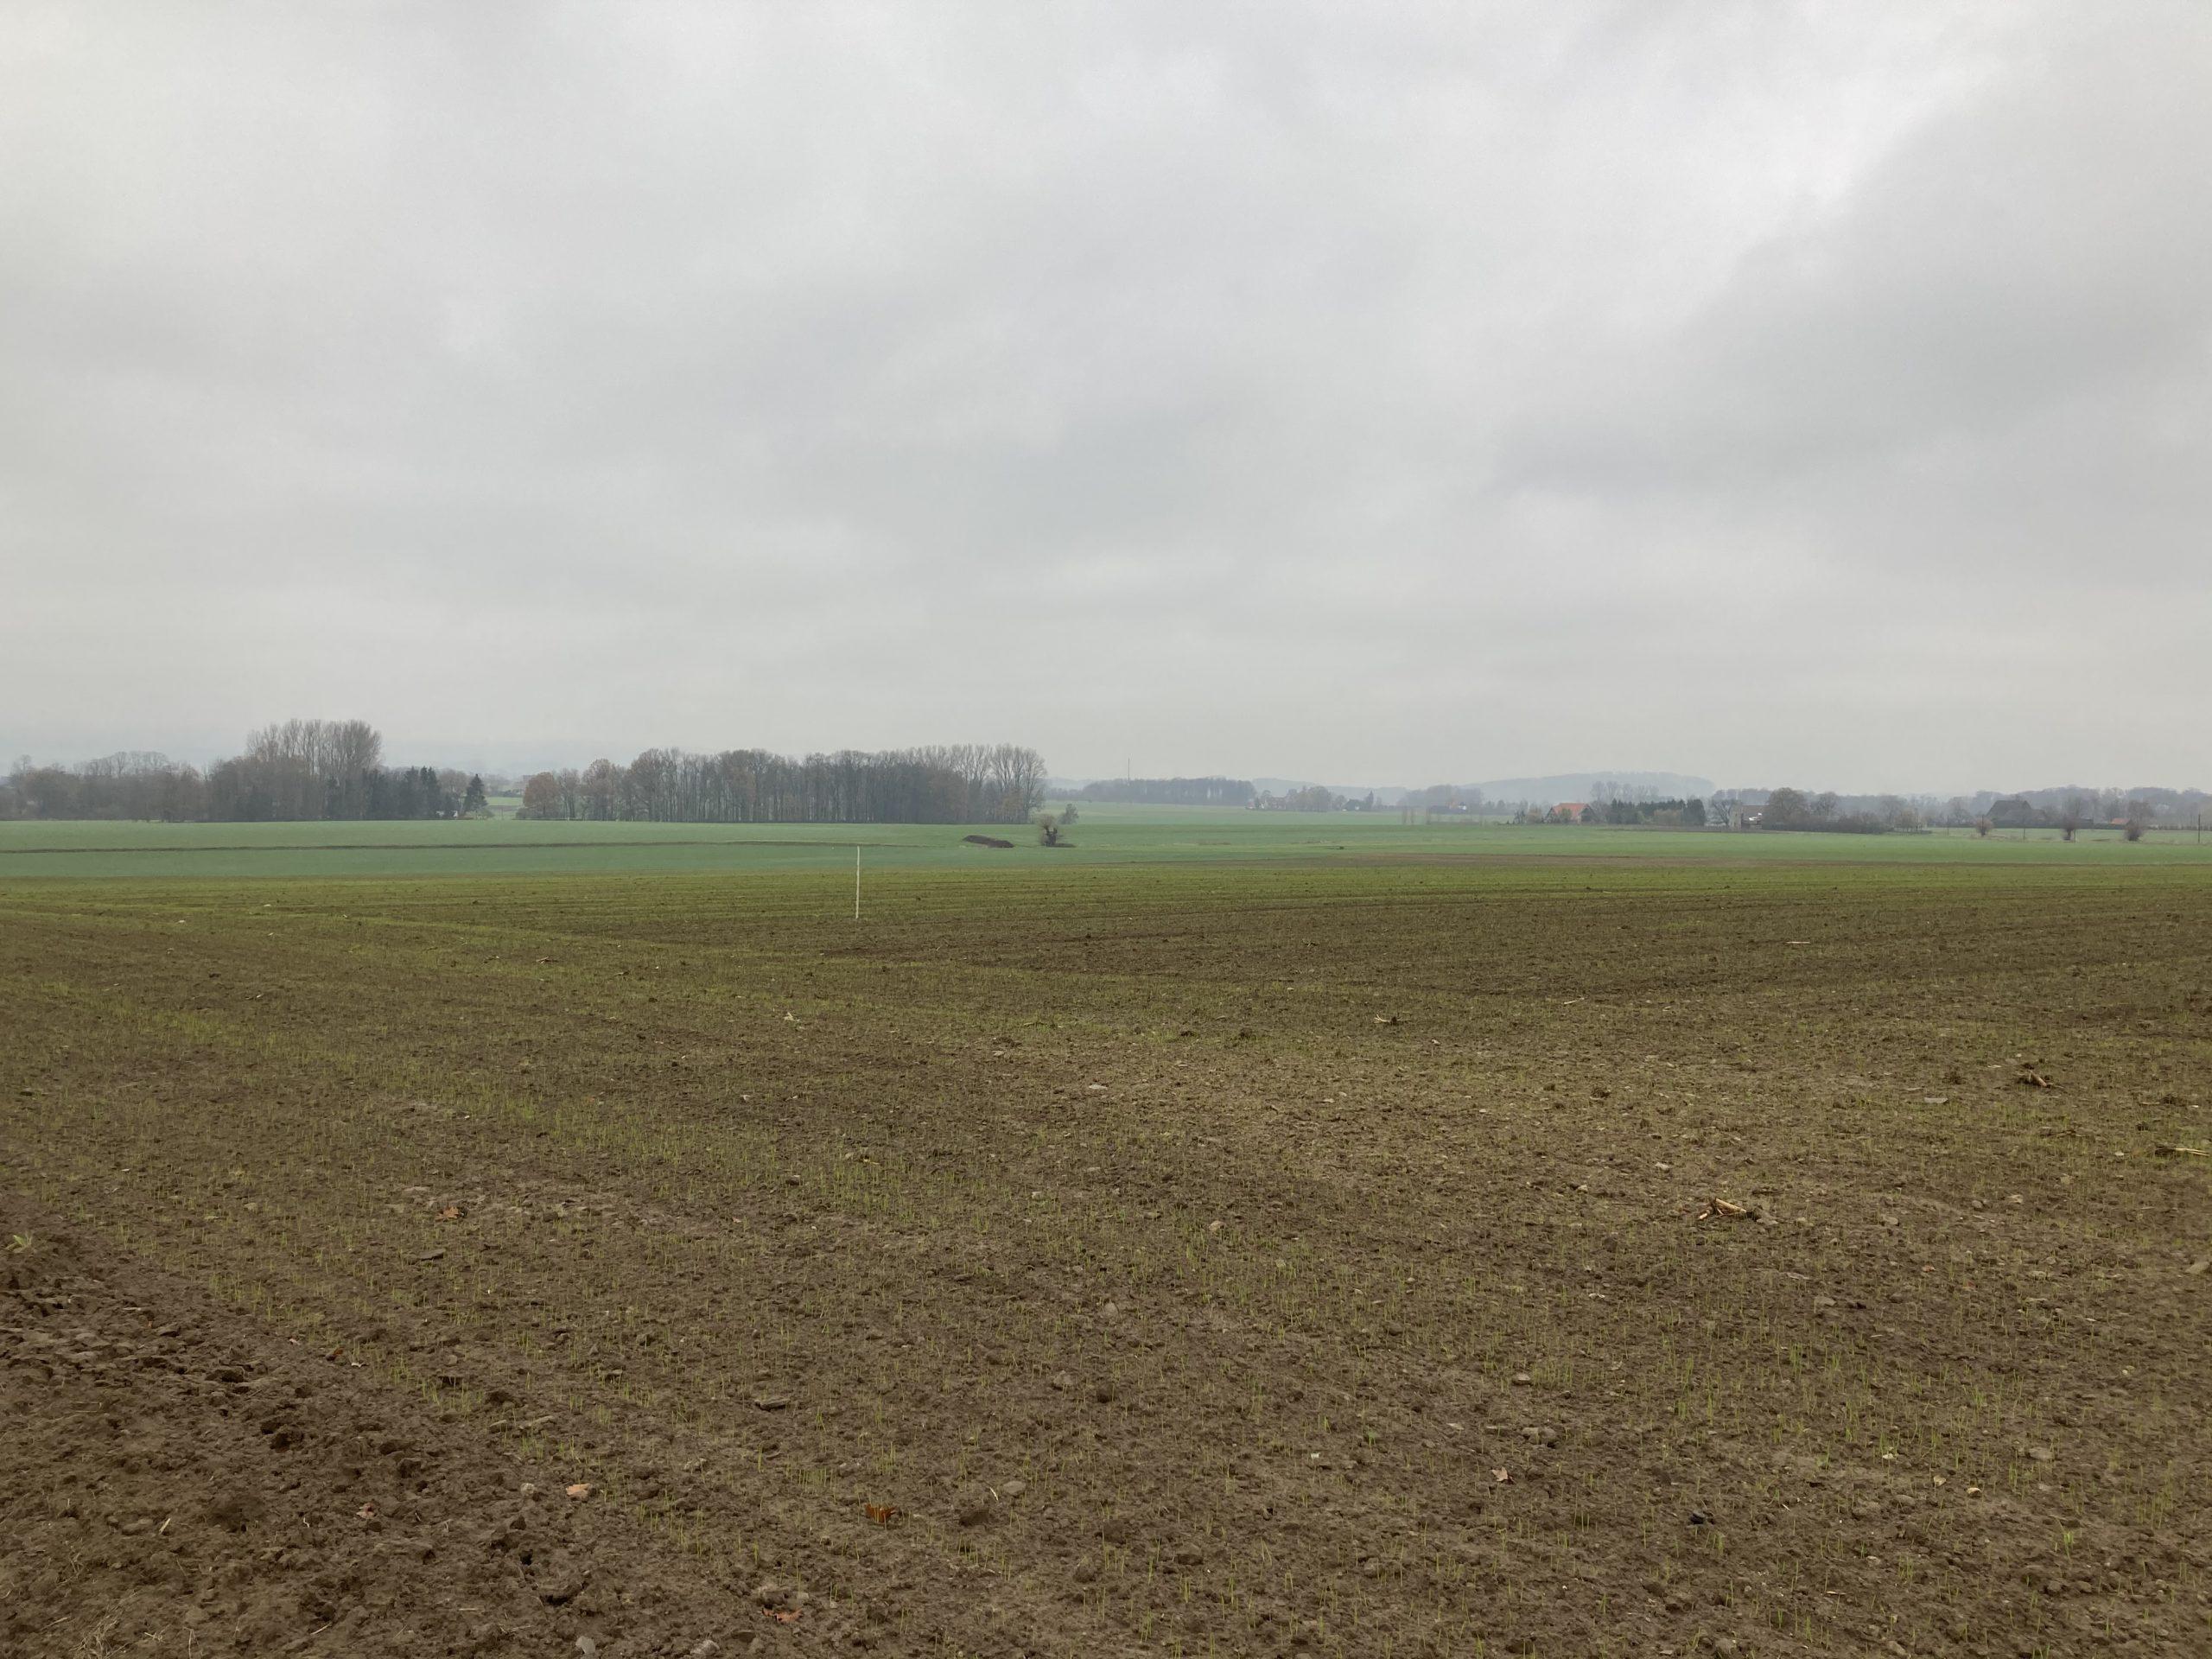 Vergleichsfläche Meierfrankenfeld 07.12.2020